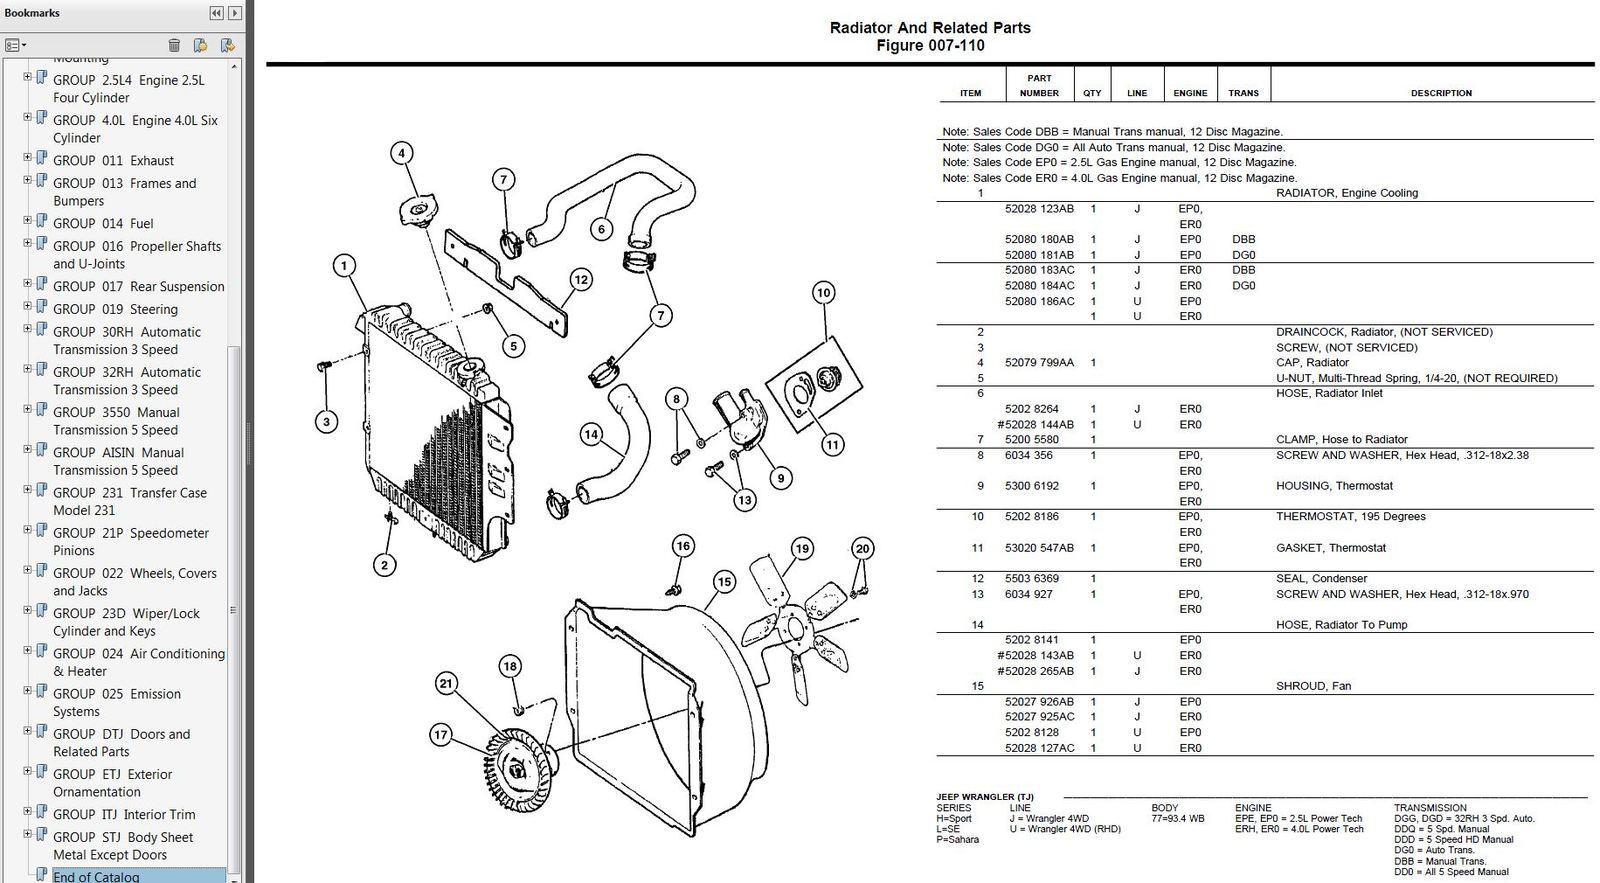 Jeep Wrangler Tj Factory Parts Catalog